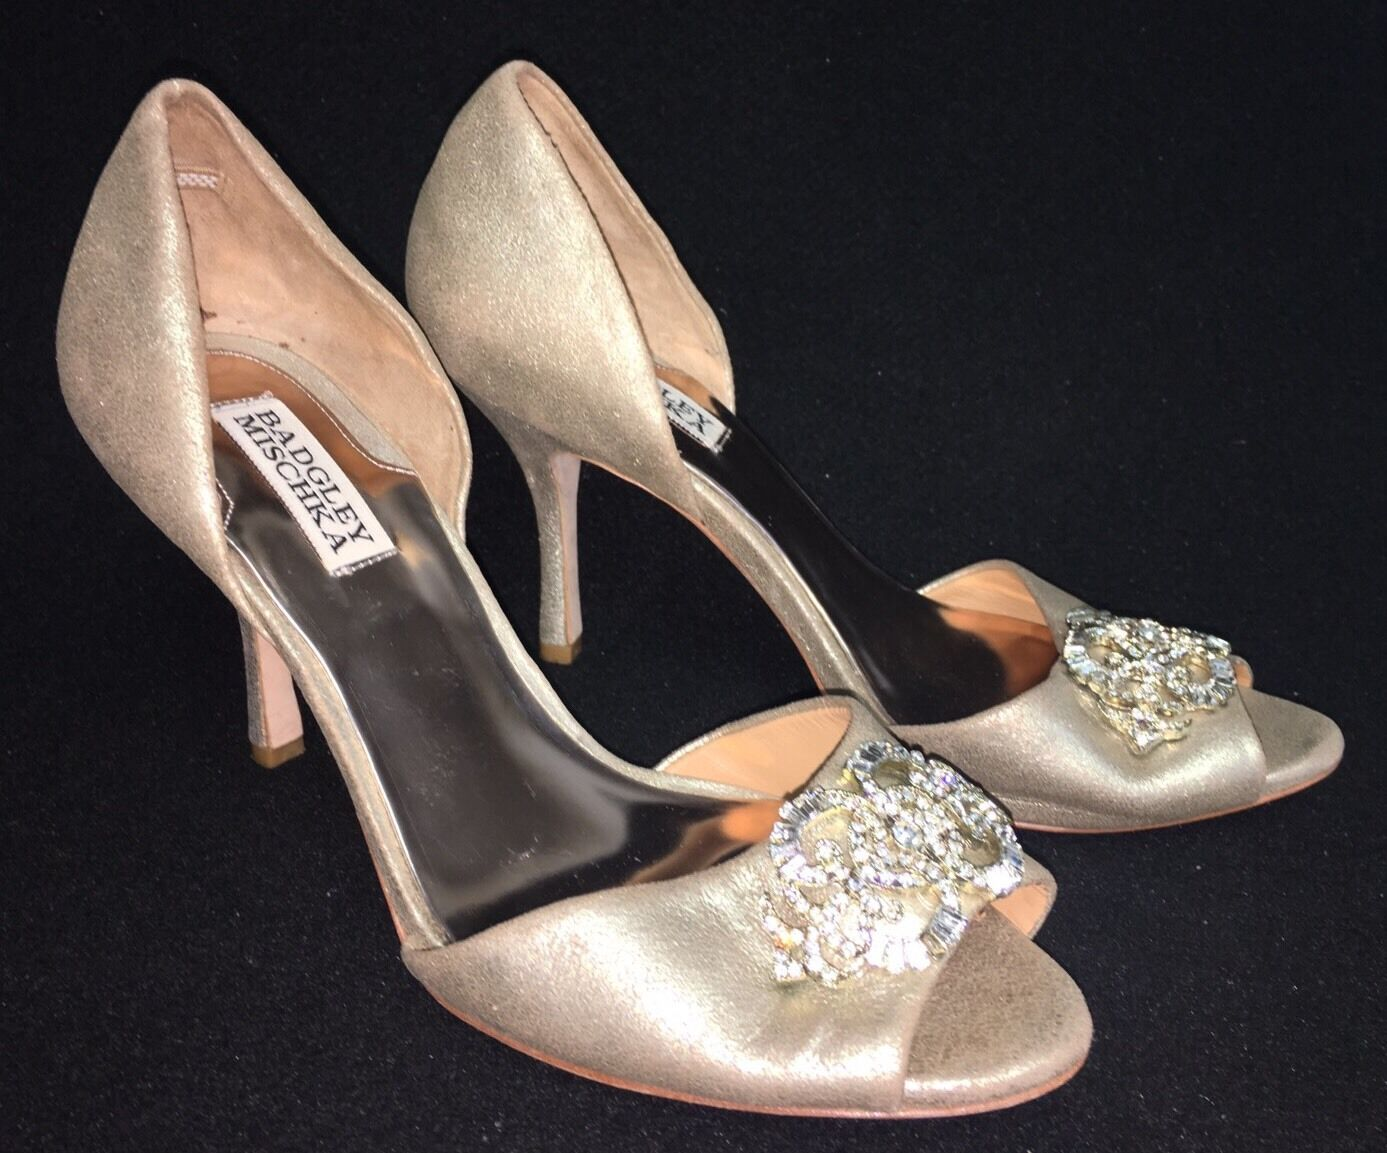 Badgley Mischka Salsa or Leather D'orsay Bridal Evening High Heel Pumps 7 9